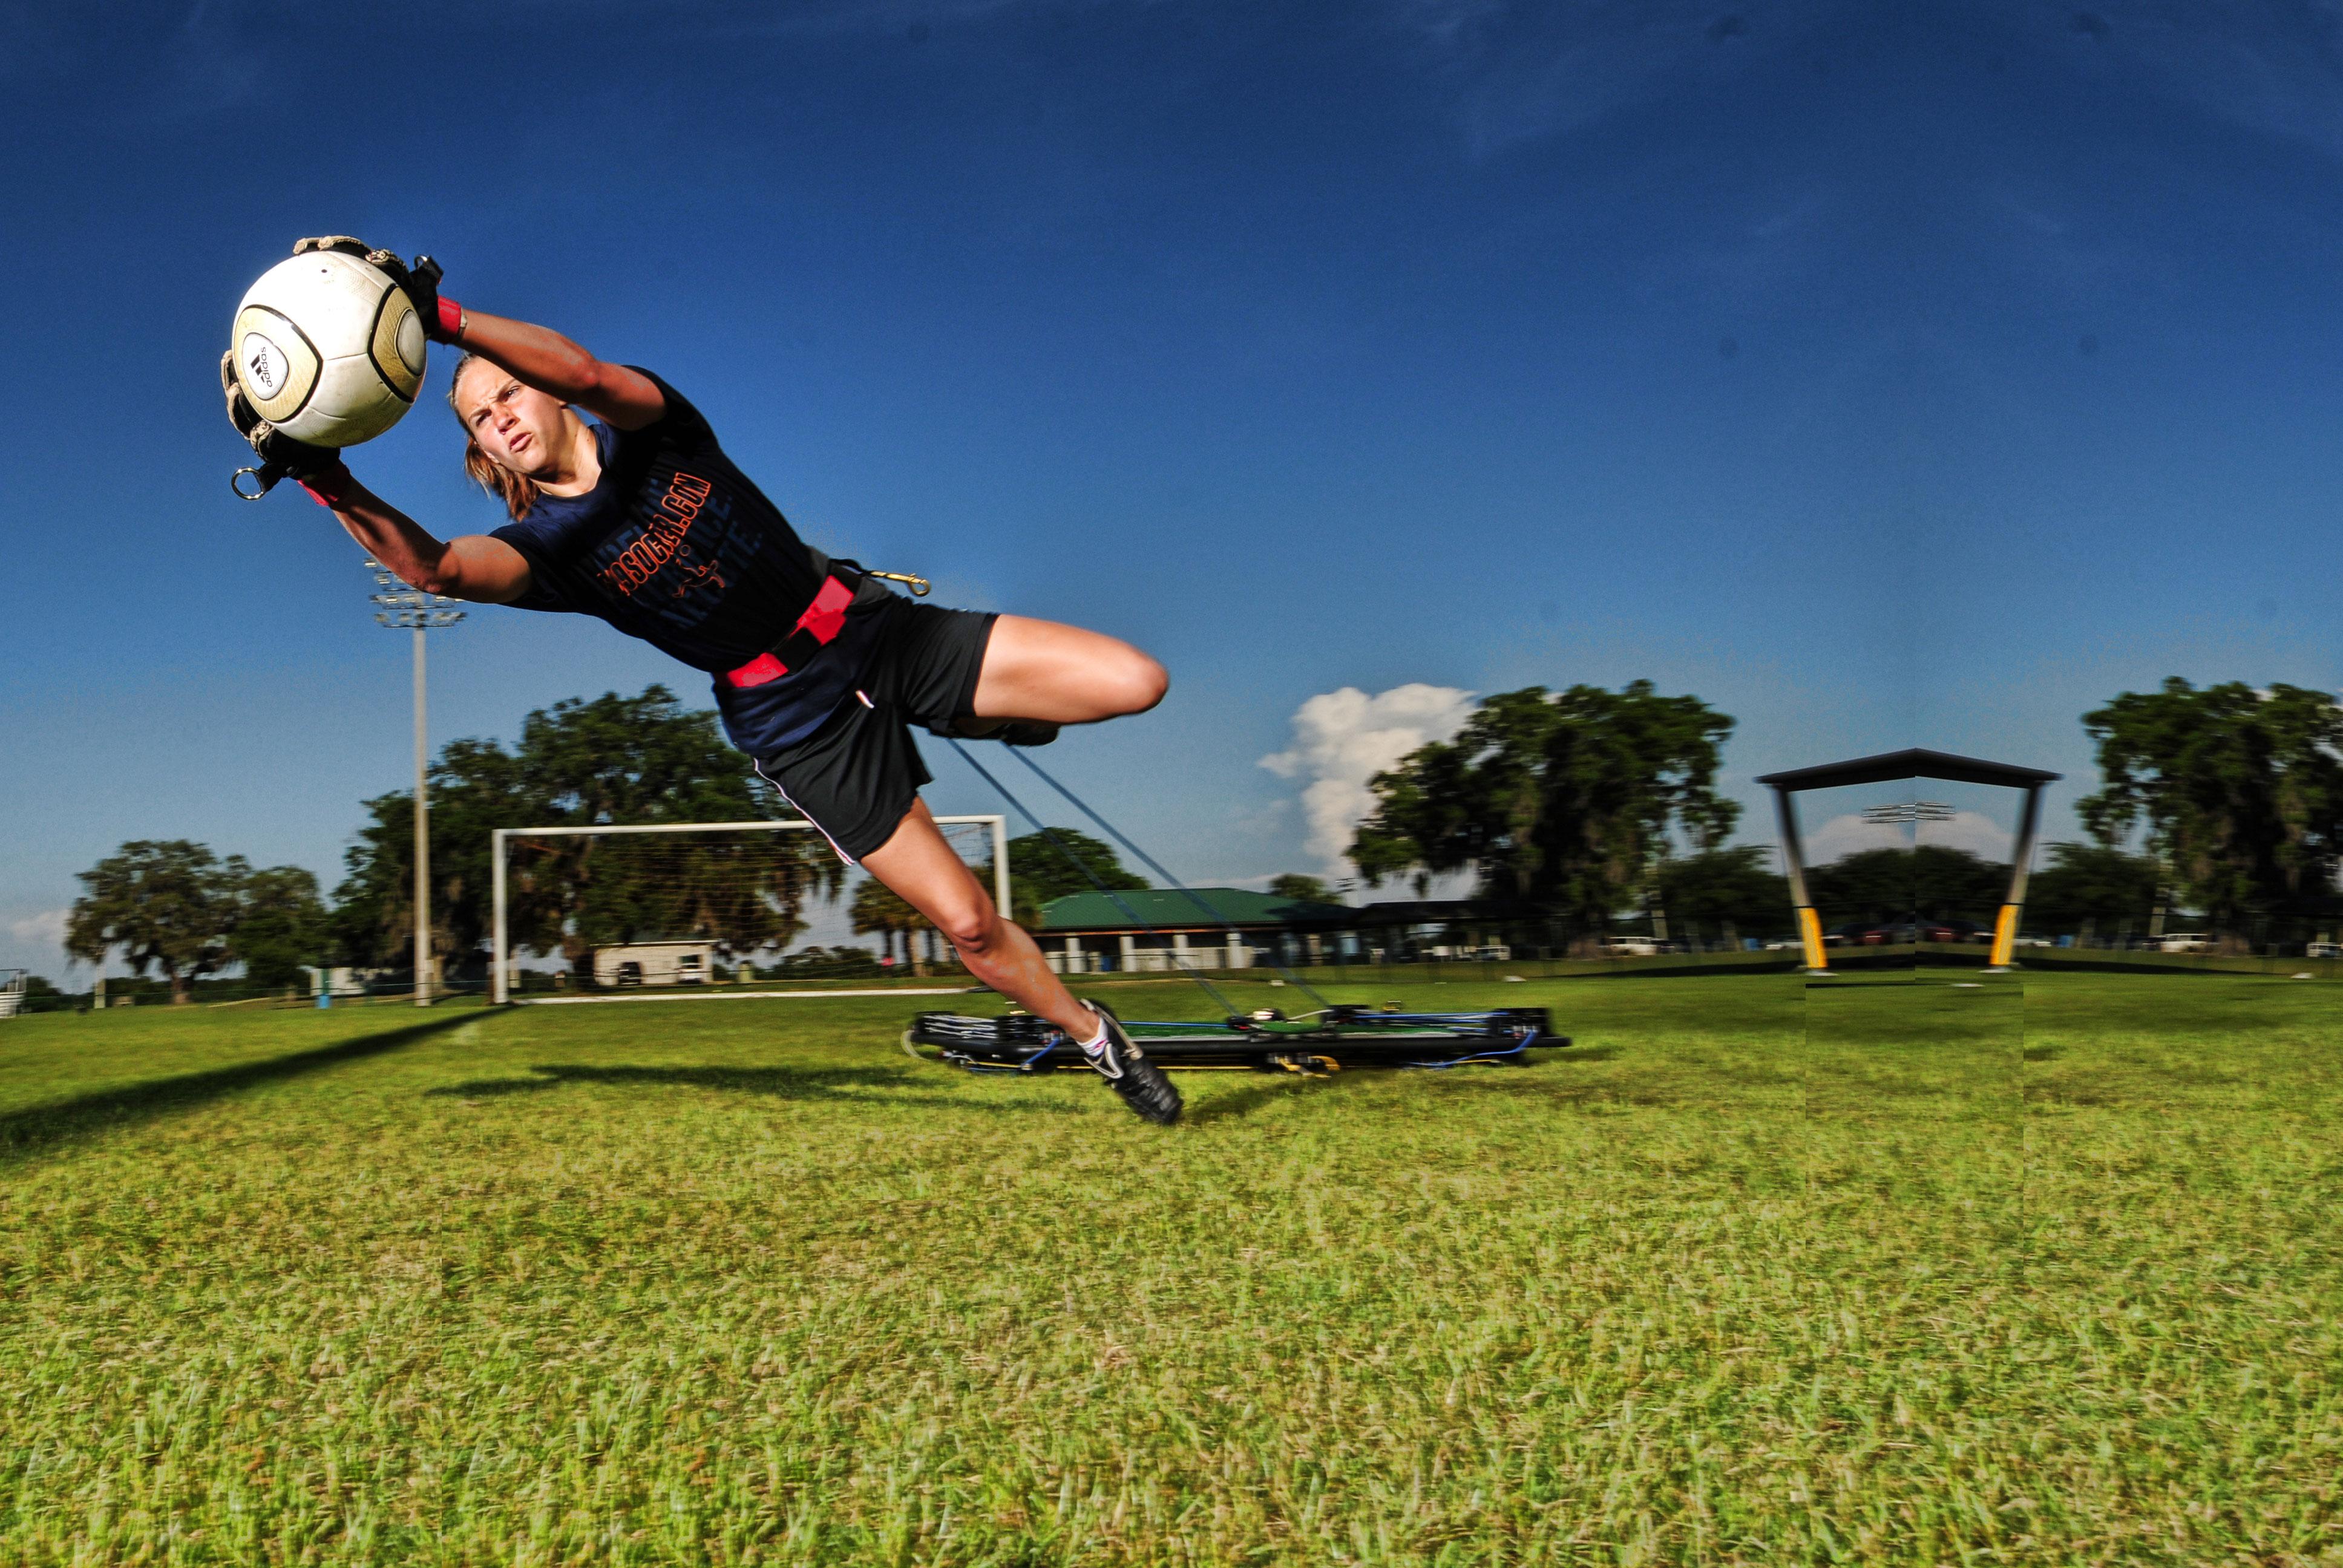 soccer training vertimax